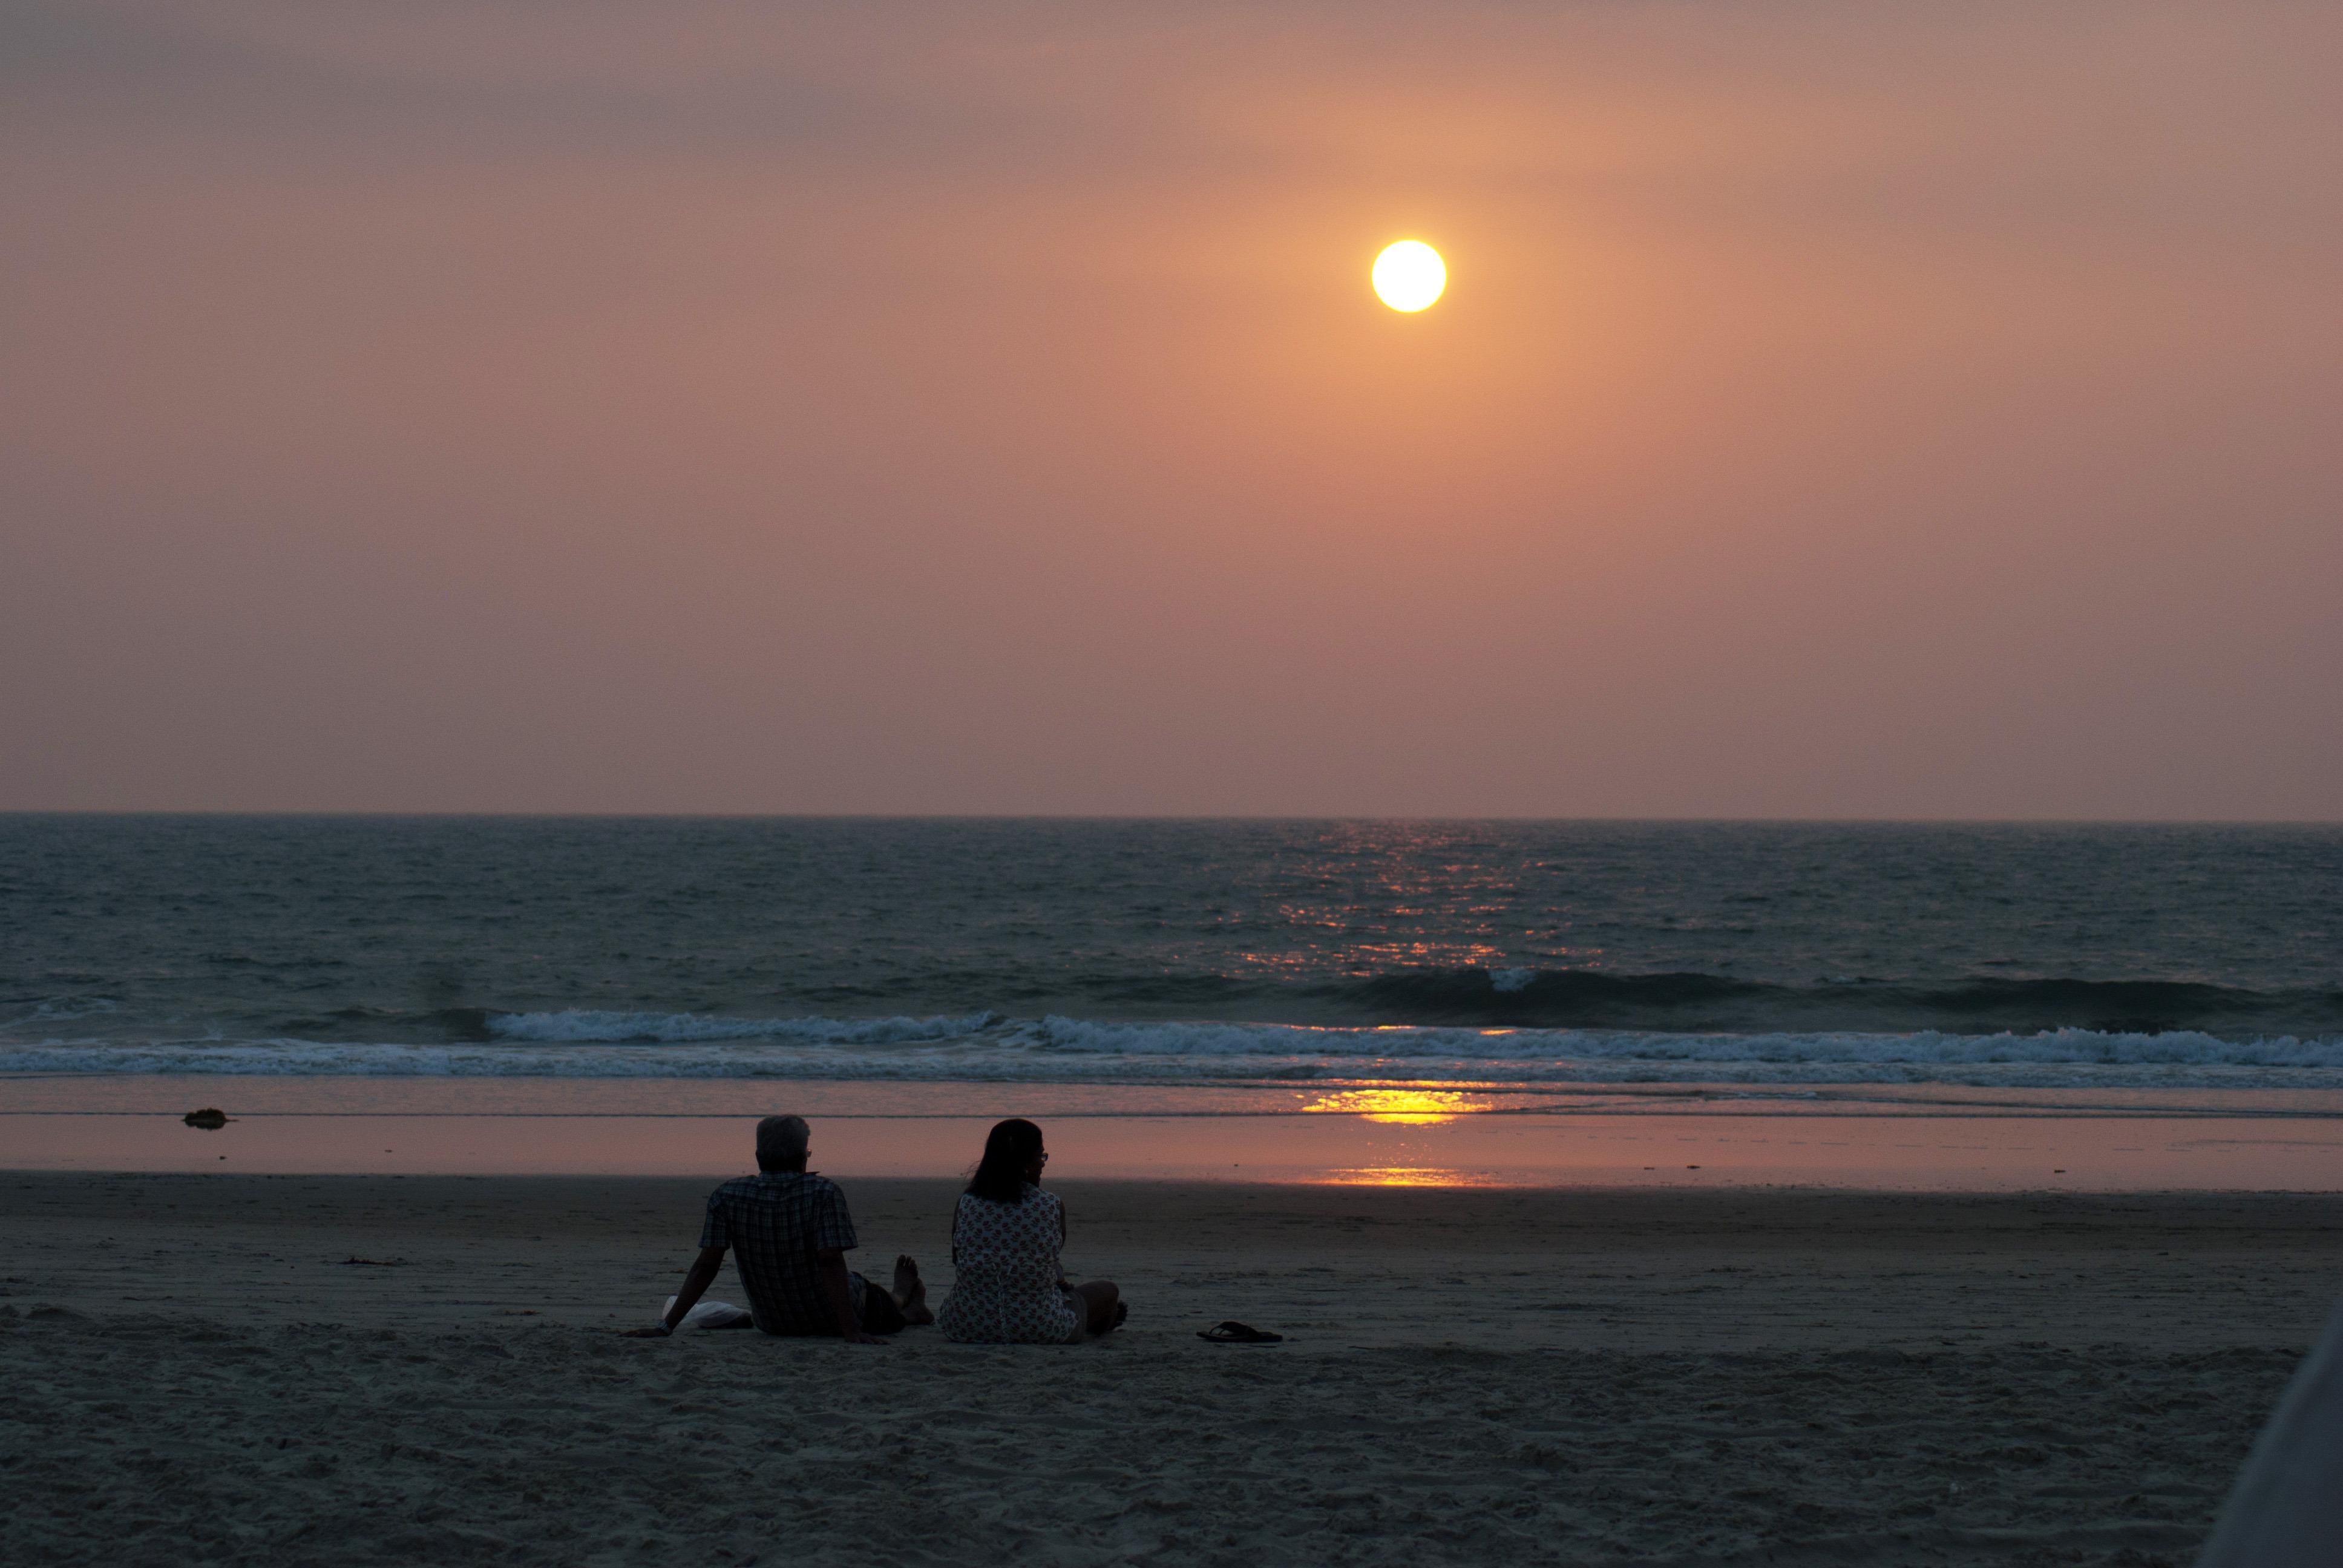 картинки море закат пляж двое цвета